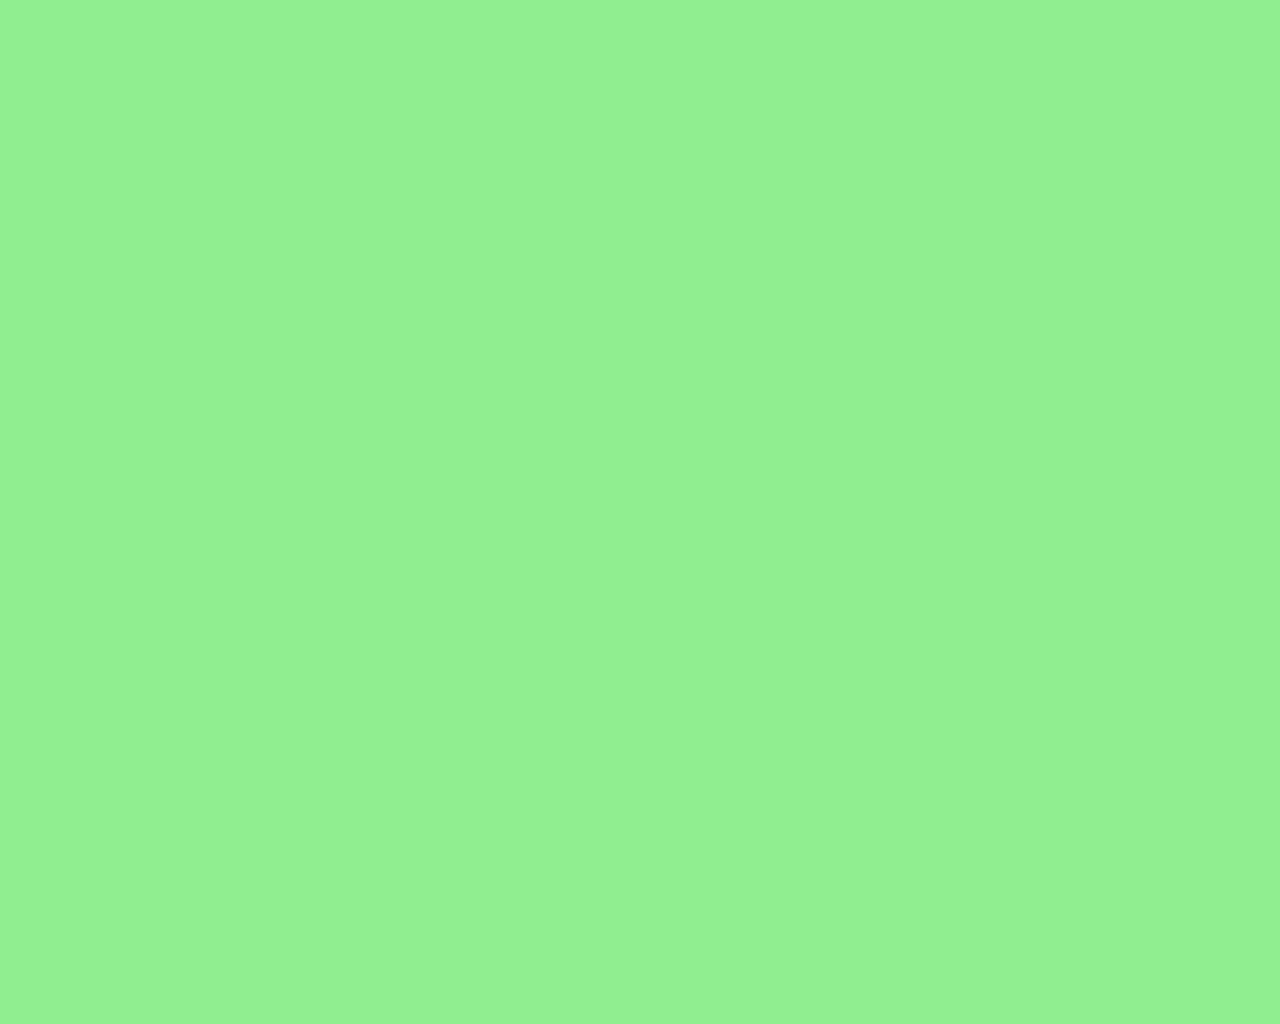 Light green color background images